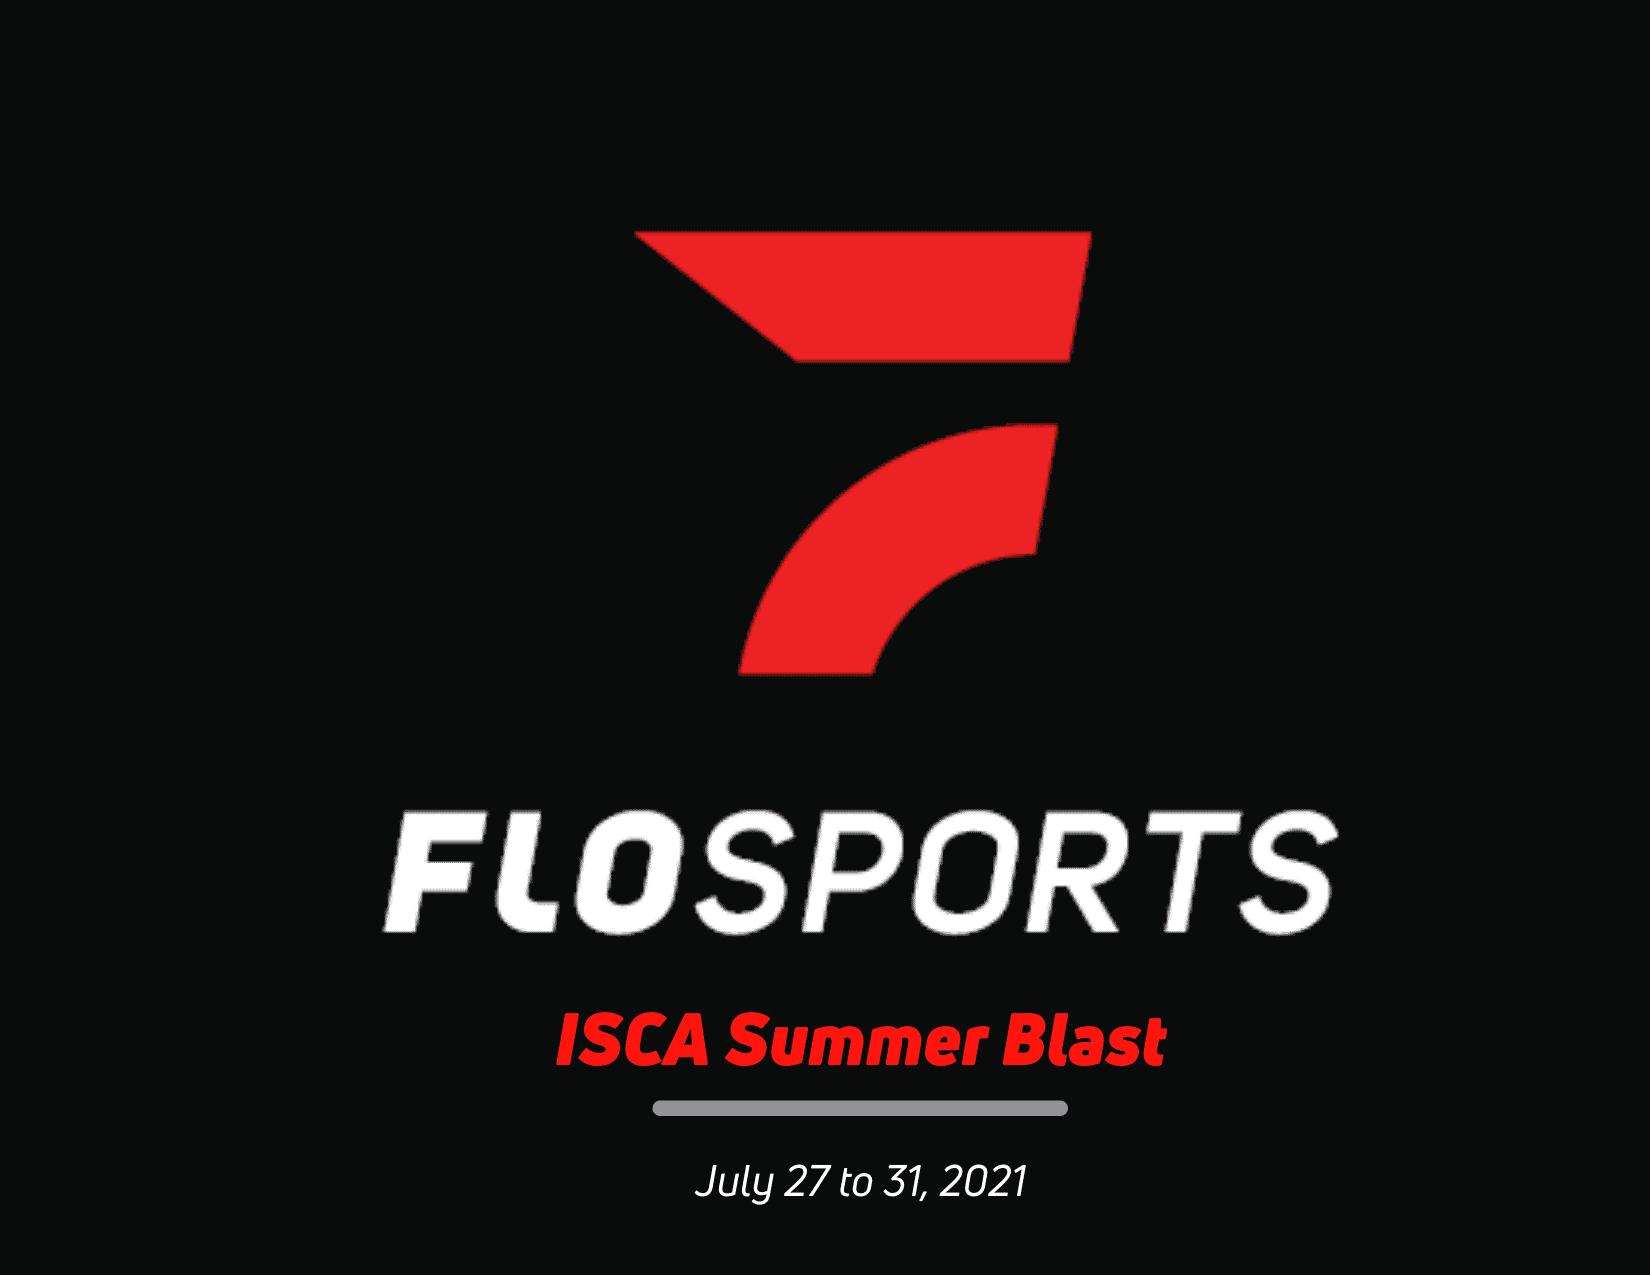 FLO SWIMMING watch the ISCA Summer Blast